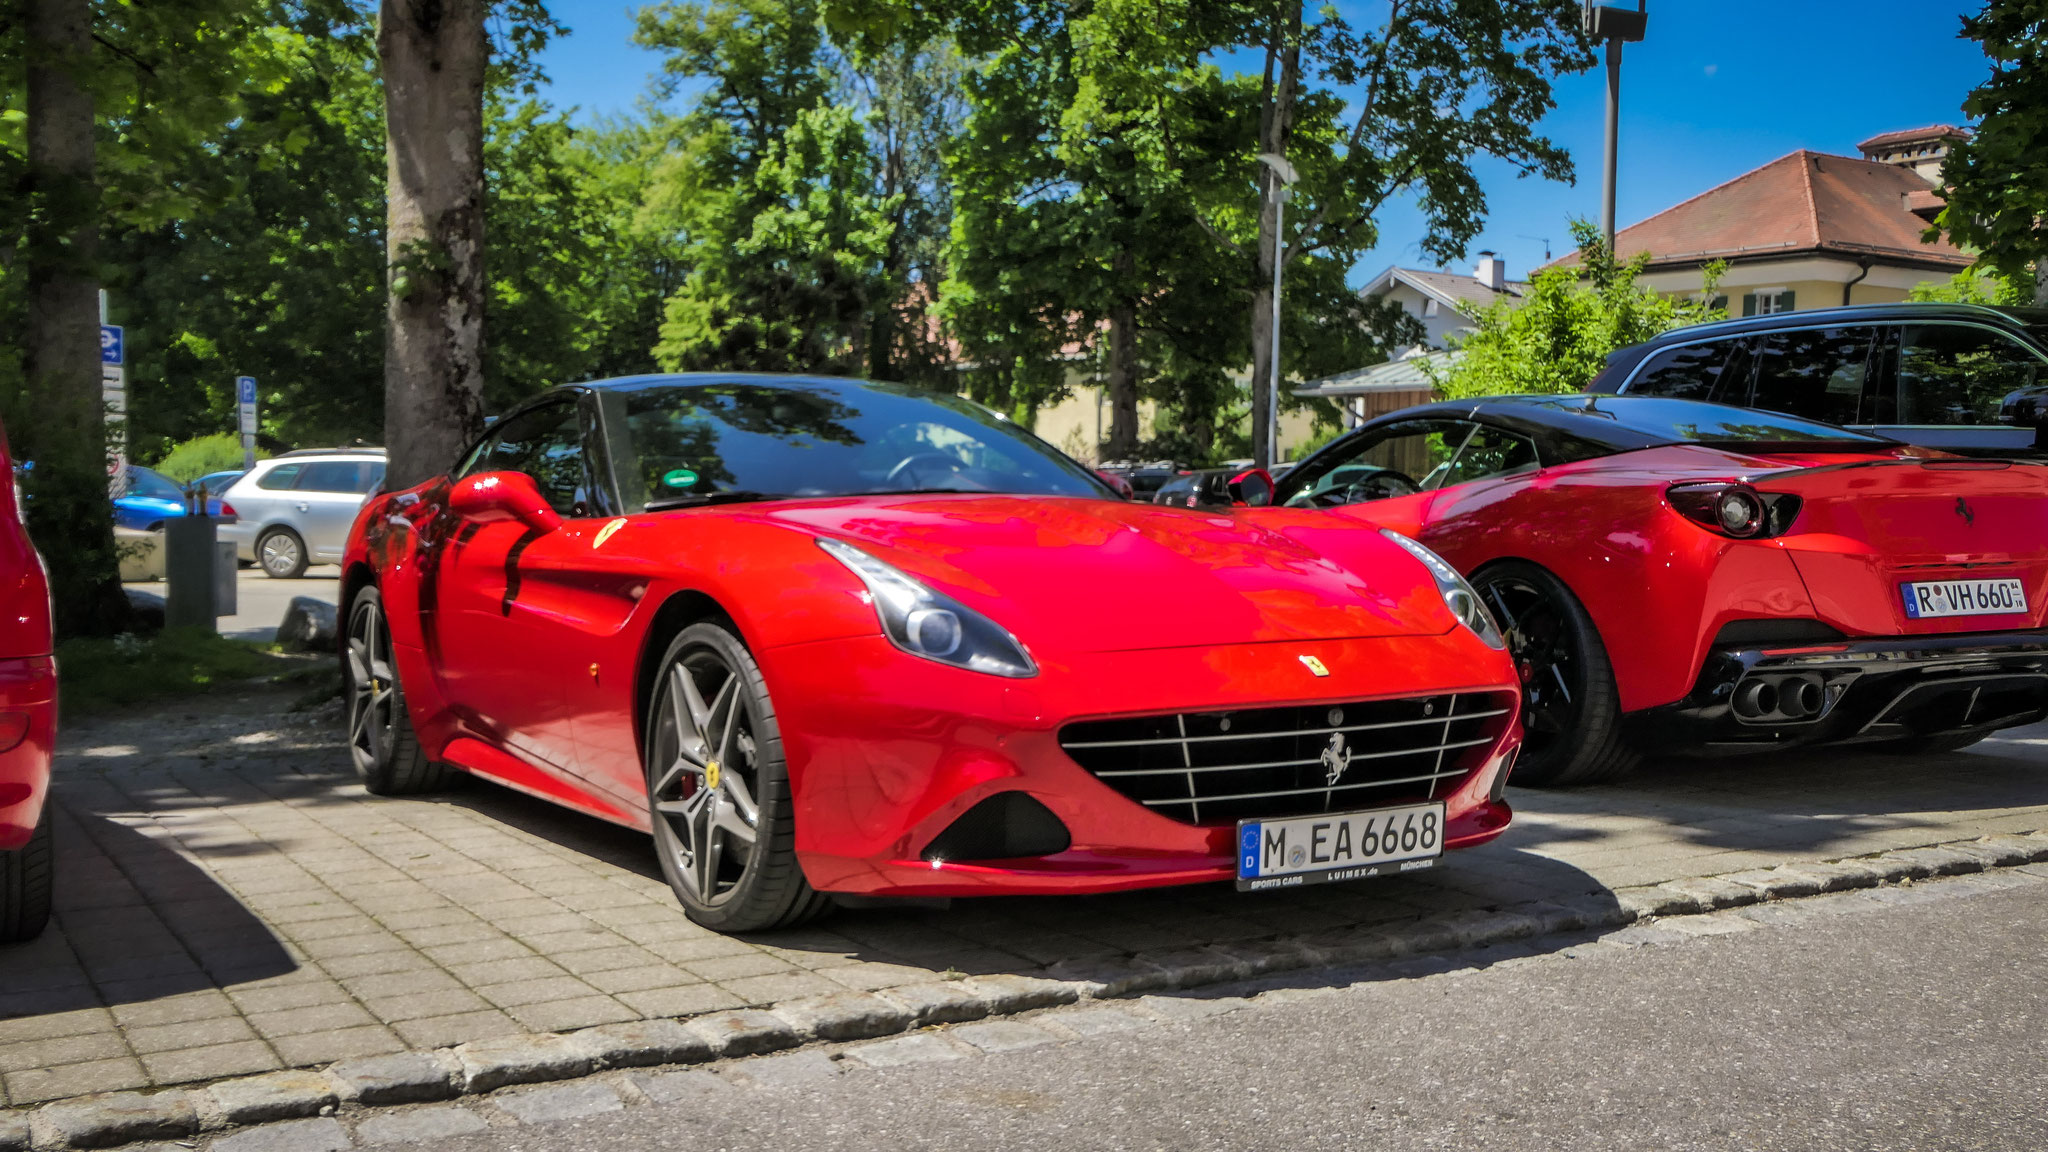 Ferrari California T - M-EA-6668